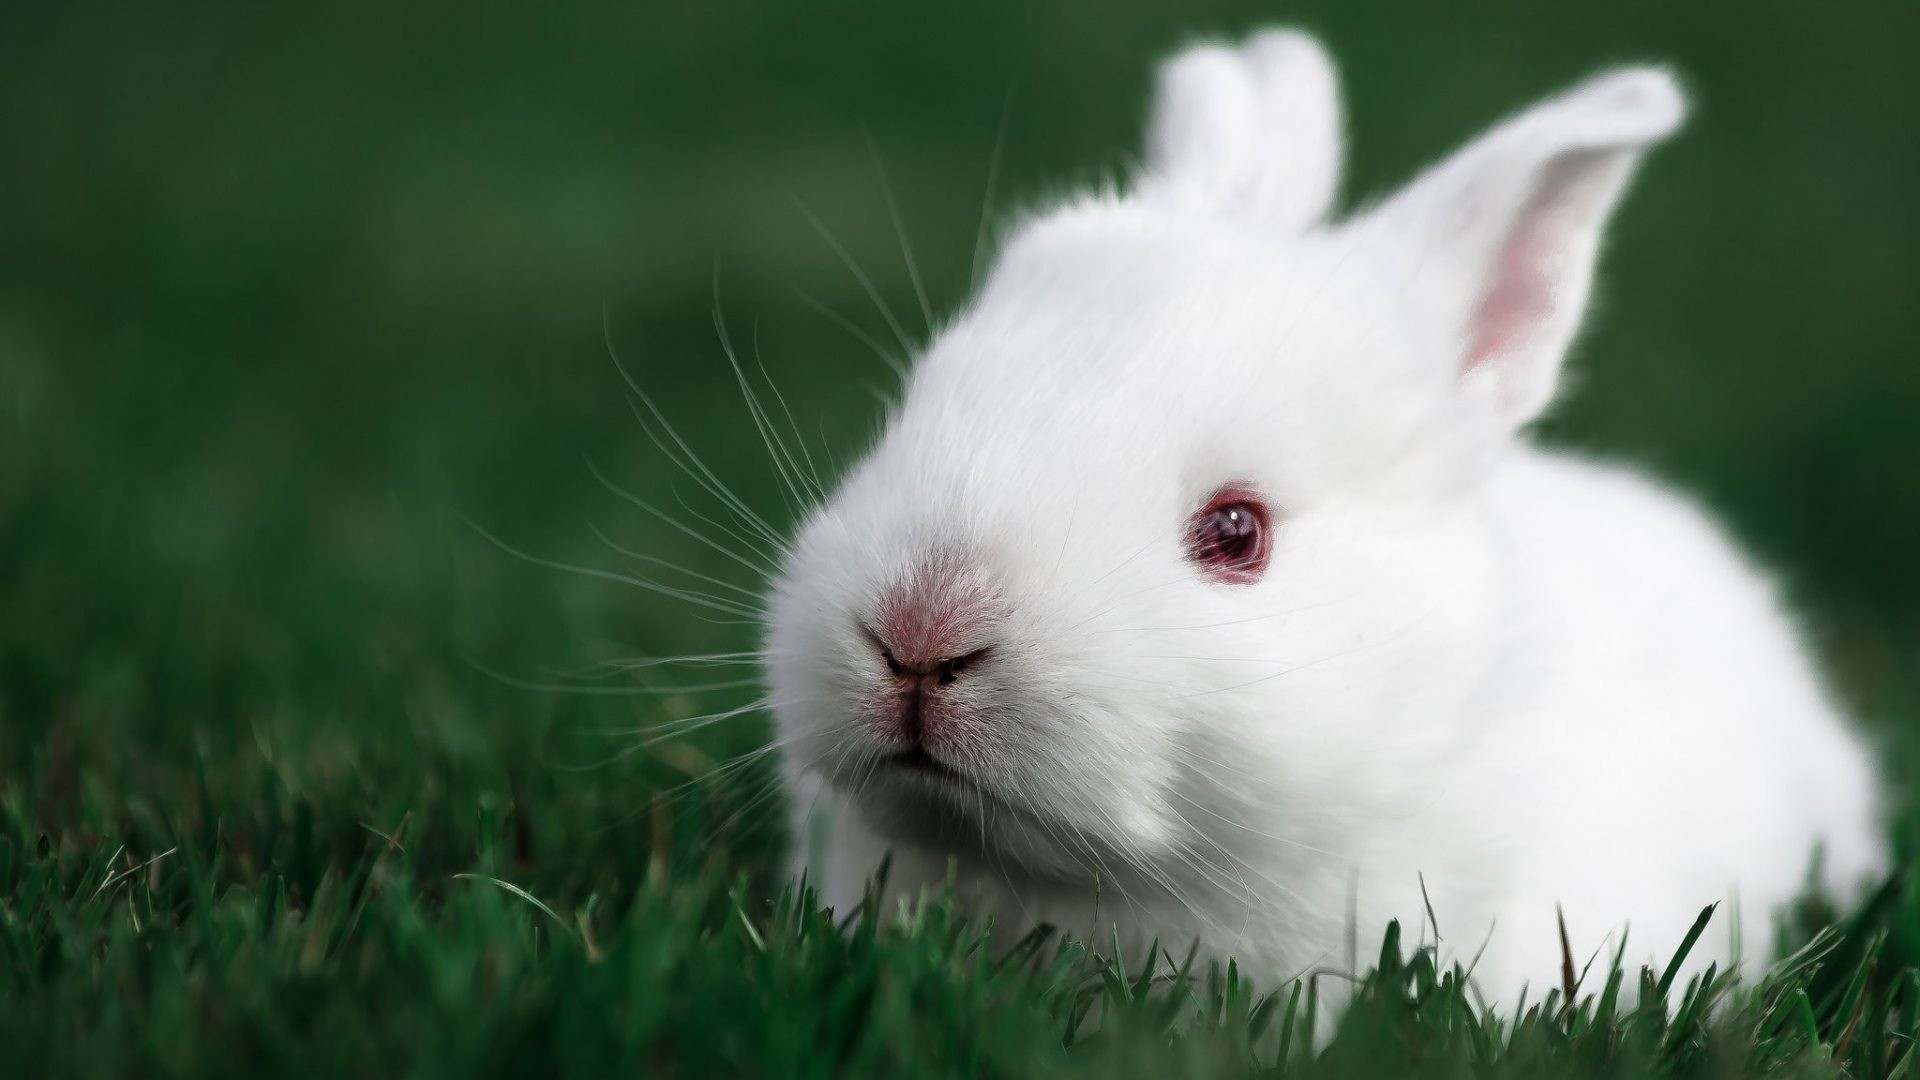 Cute White Rabbit Wallpapers For Desktop: Rabbit Wallpapers For Desktop (65+ Images